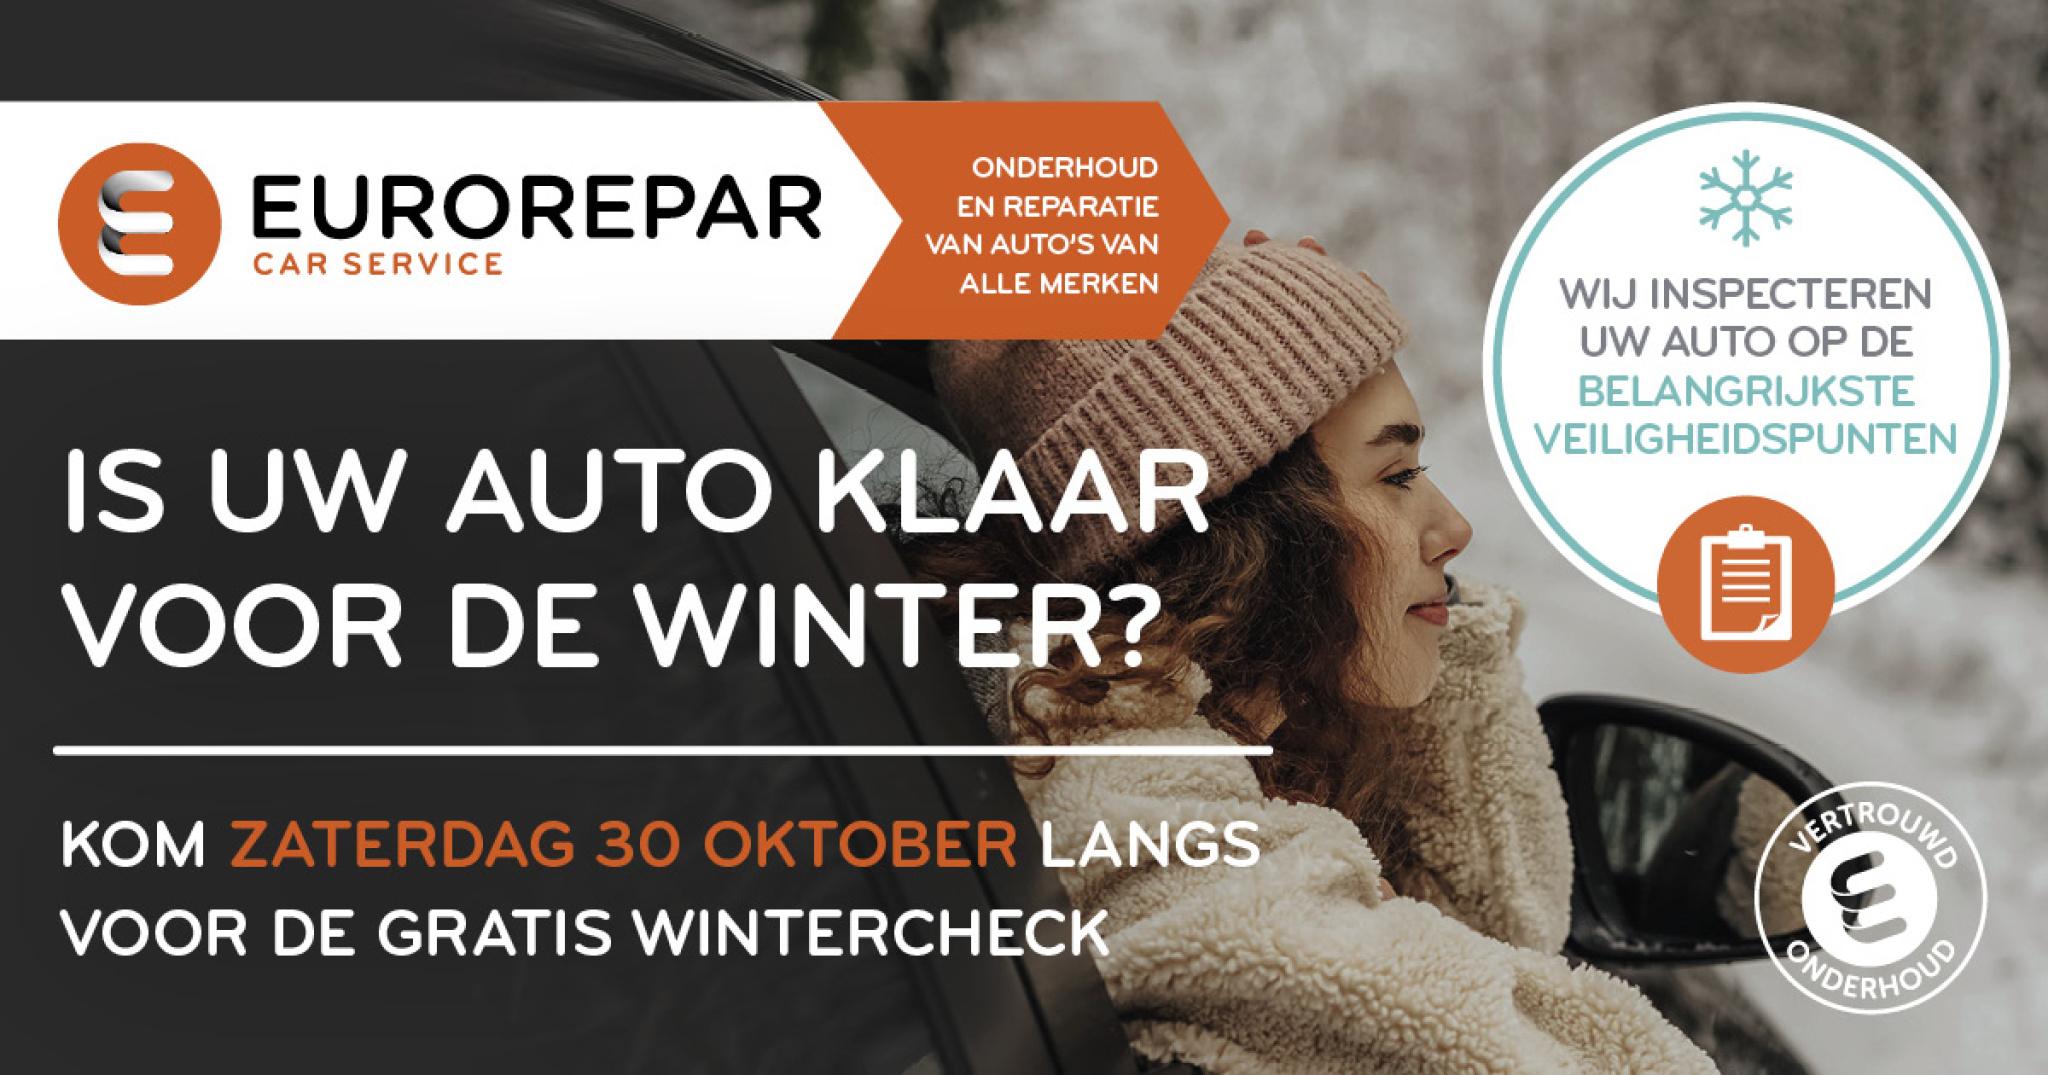 Gratis Wintercheck Op 30 Oktober-2021-10-14 14:26:01